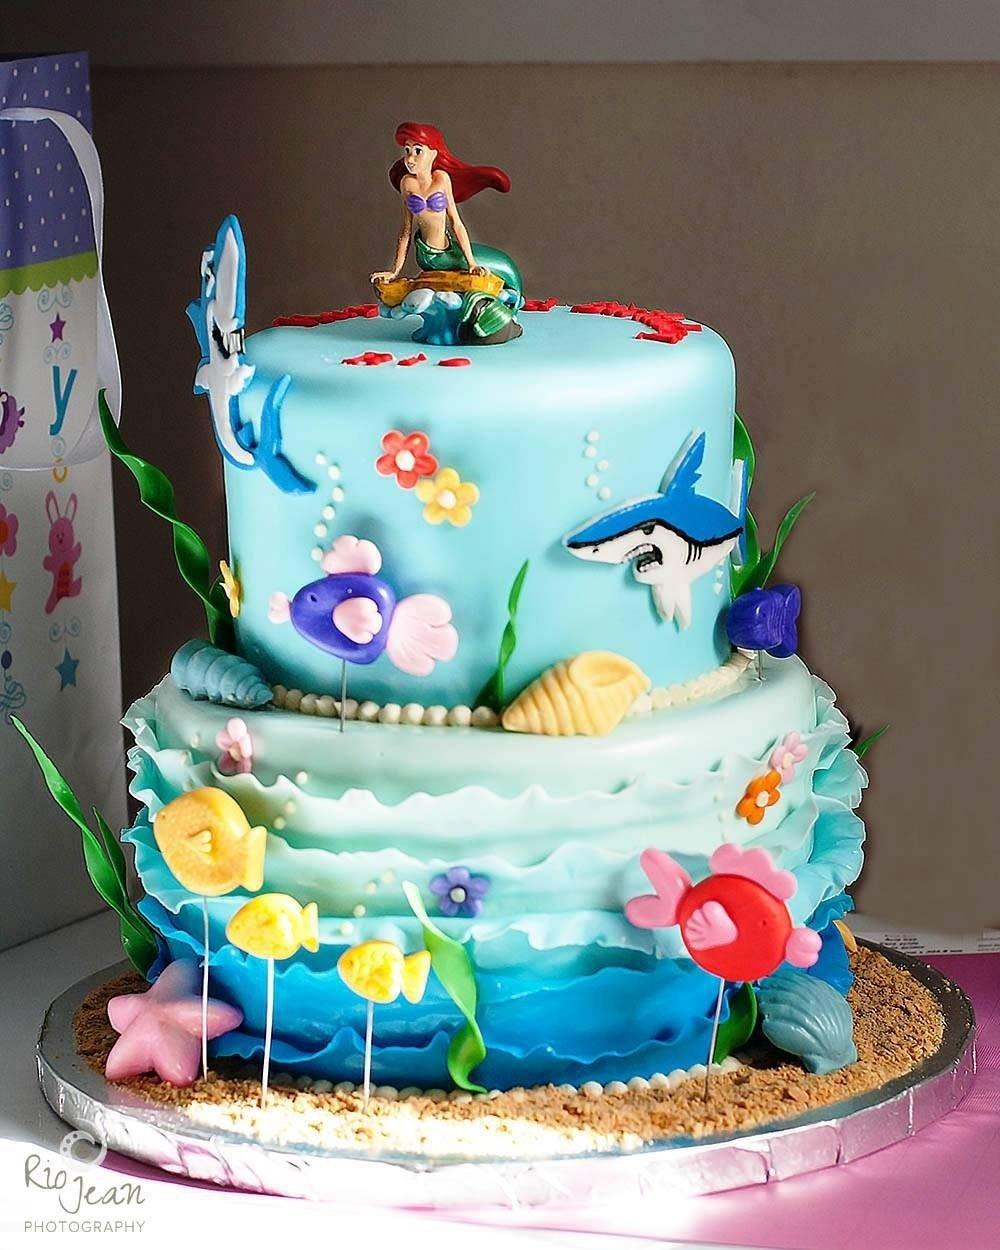 10 Great Little Mermaid Birthday Cake Ideas little mermaid birthday cake idea protoblogr design little 2021